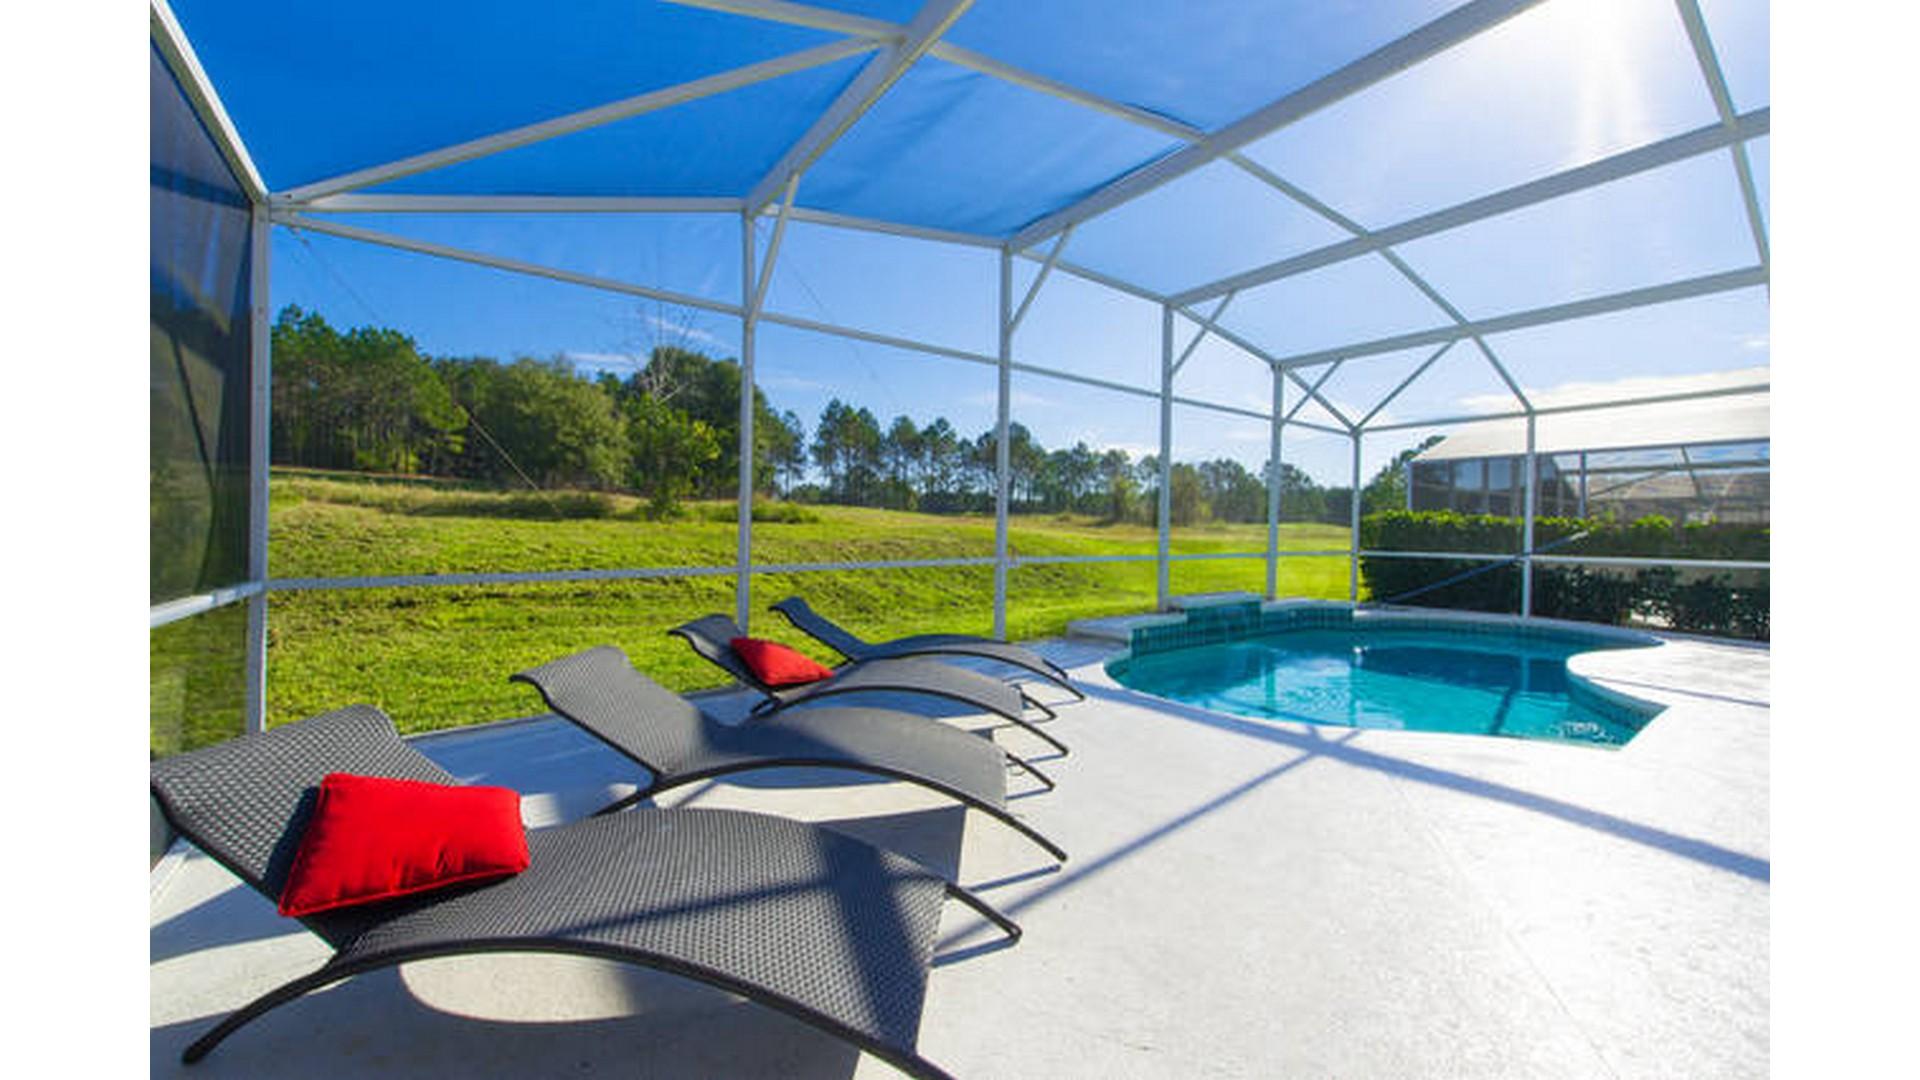 14 Room Disney Golf Resort Villa FREE Greenfees & Tennis, SPA (Disney Estate)